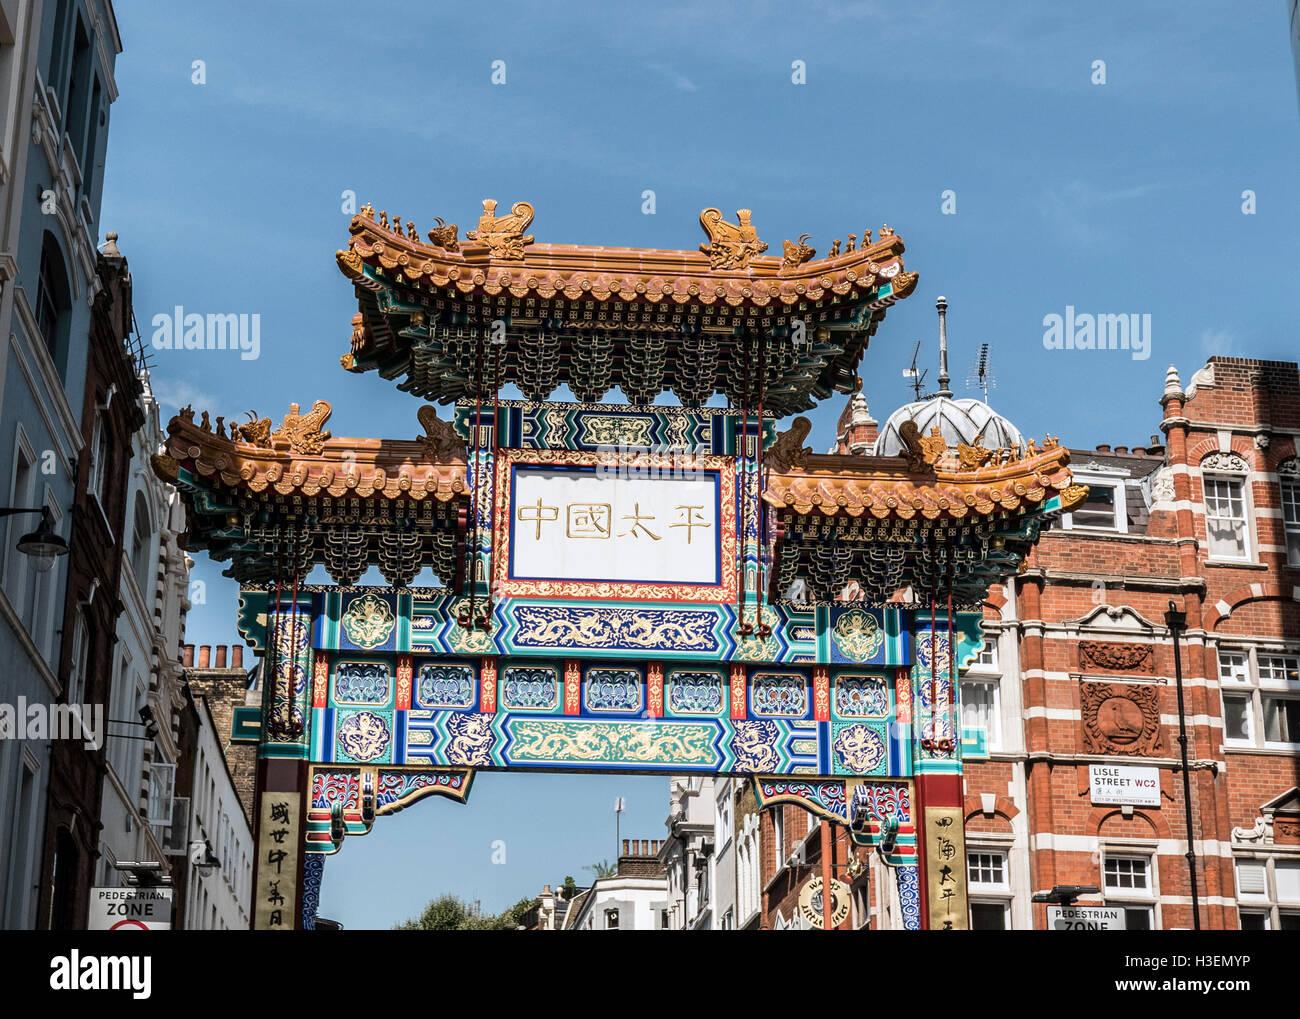 China Town in Soho London - Stock Image